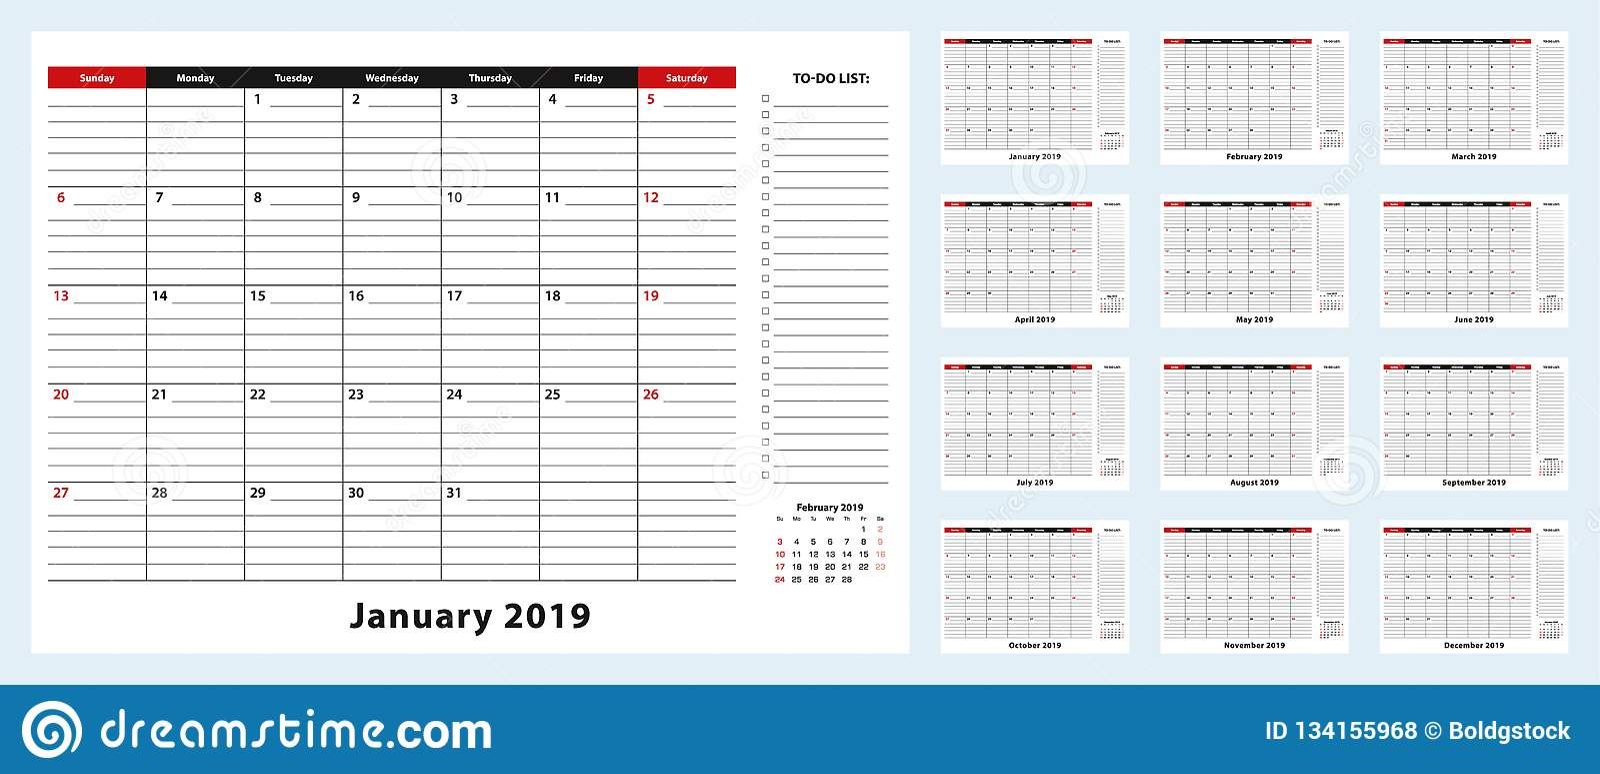 Calendrier Mensuel Decembre 2019.Calendrier Mensuel De Protection De Bureau De Vecteur